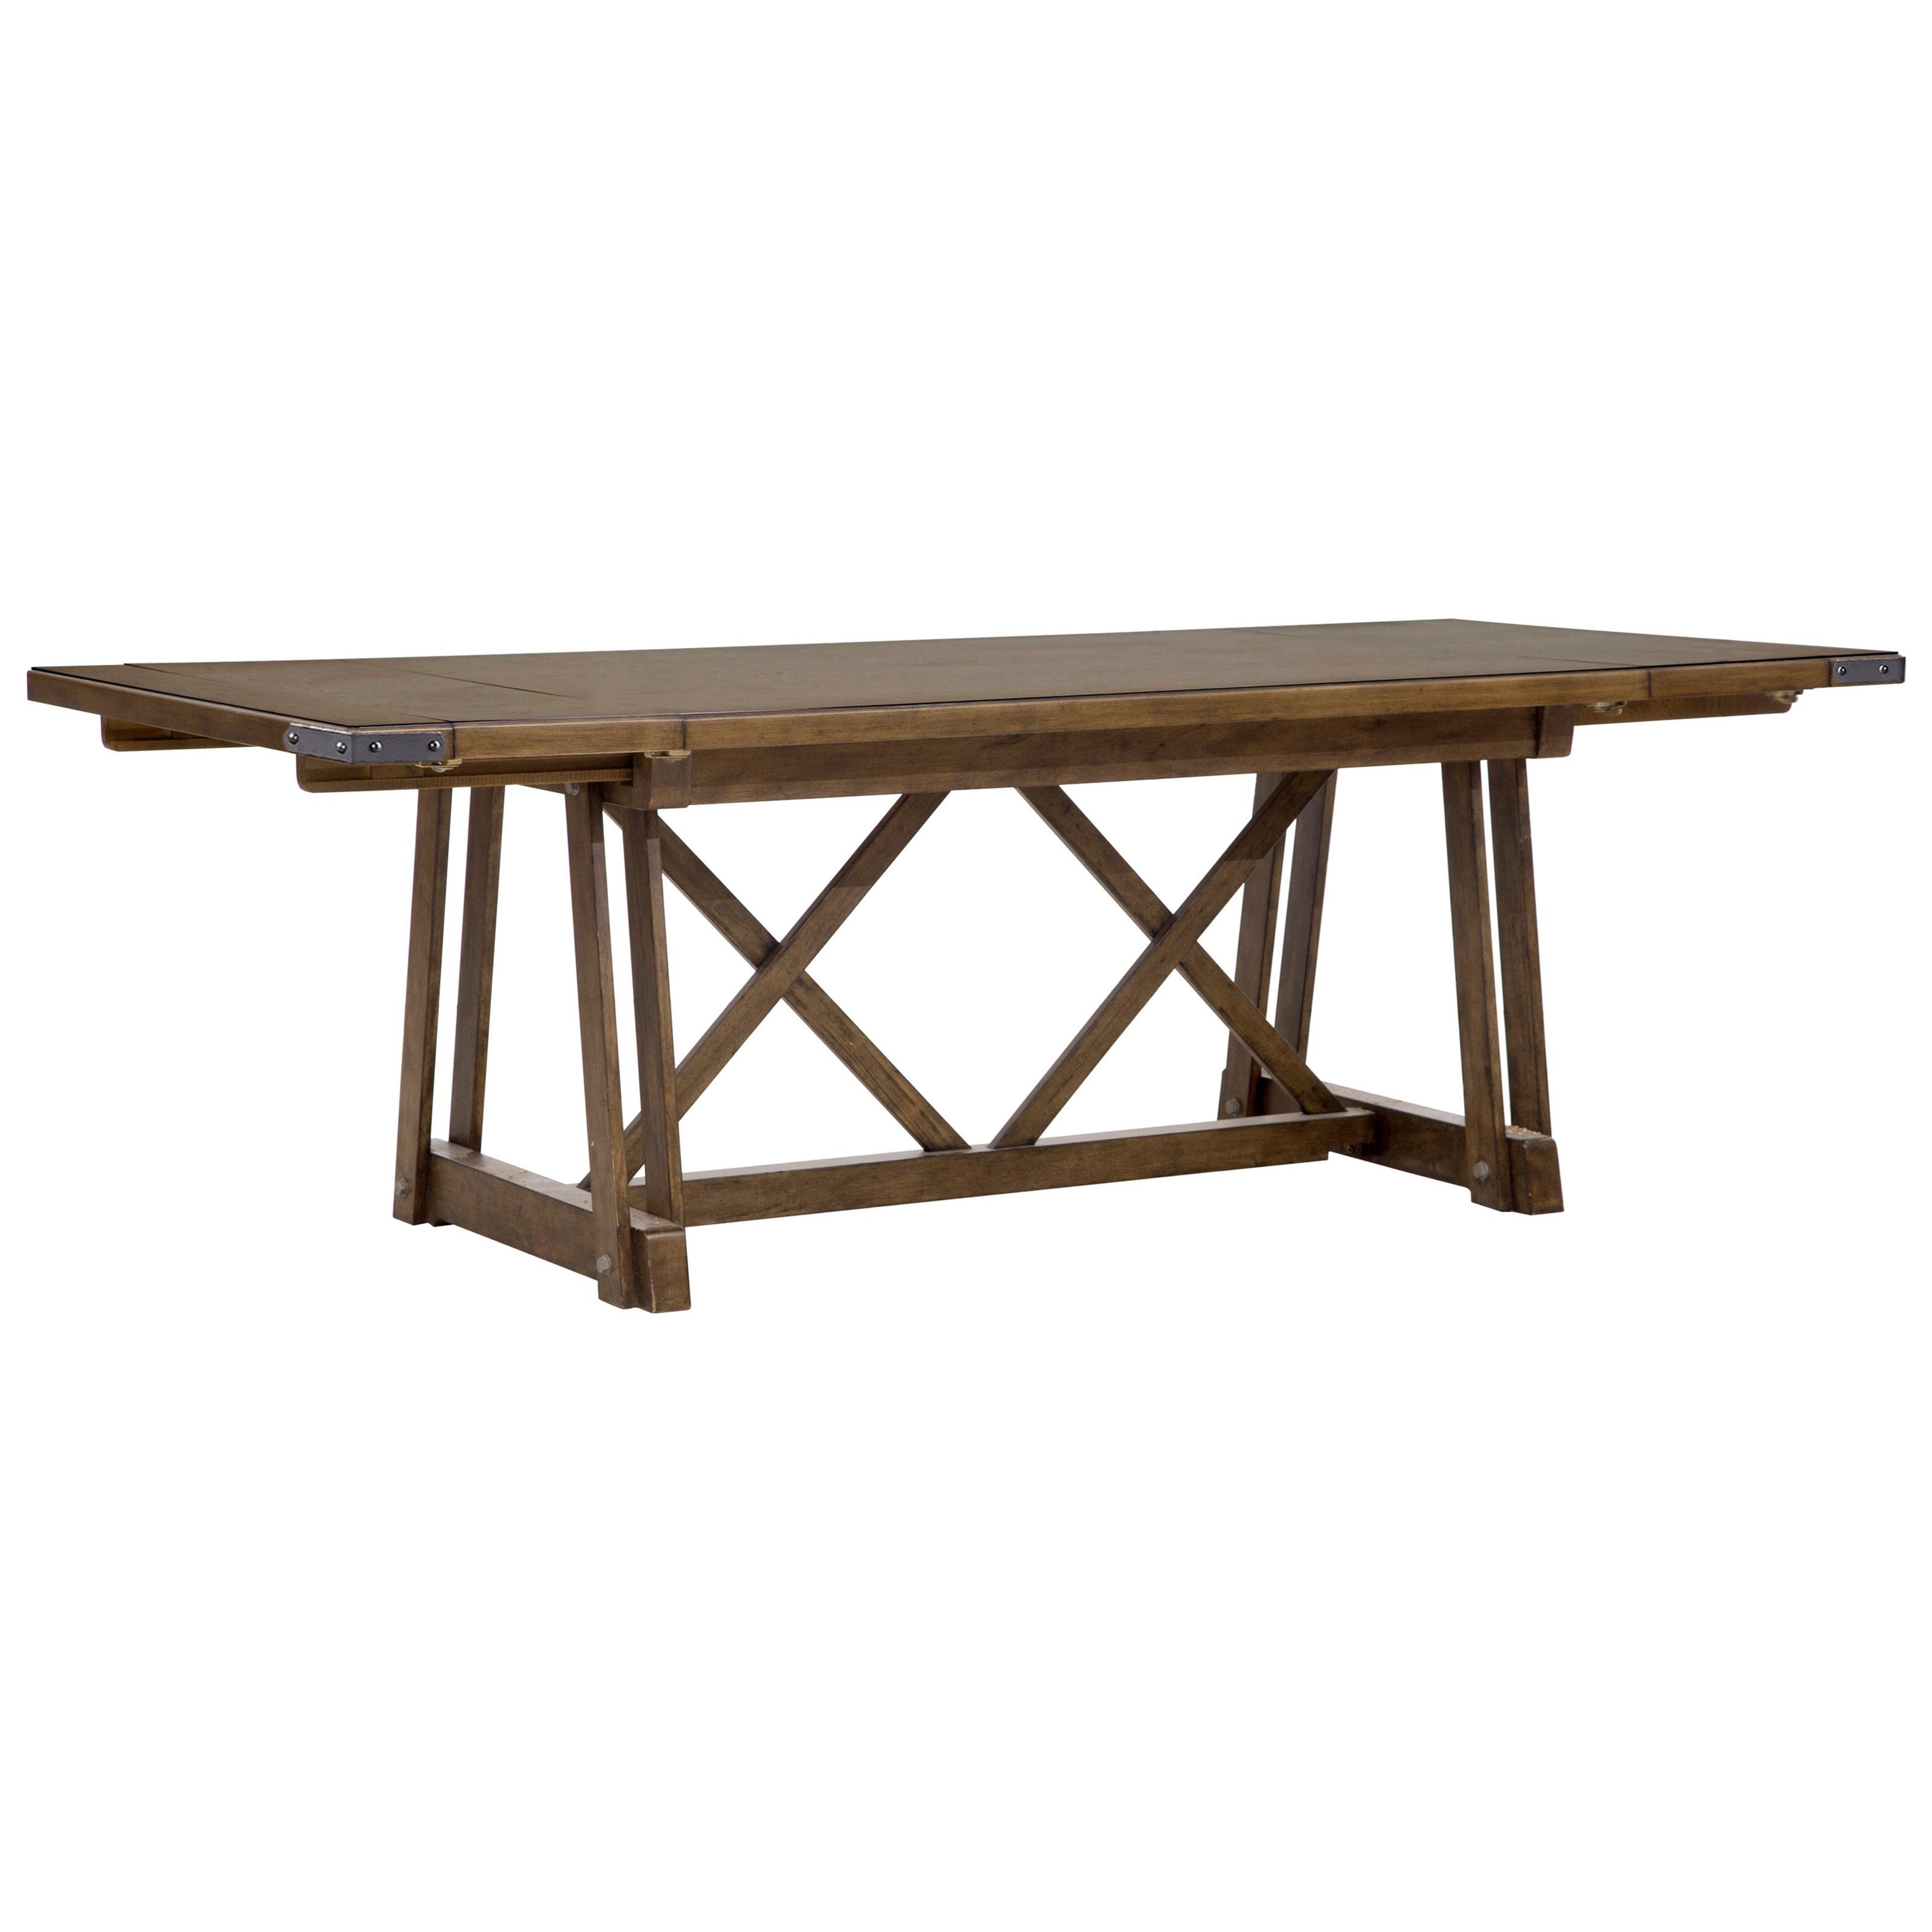 ... John V Schultz Furniture By Pulaski Furniture Weston Loft 7 Piece  Trestle Table And ...